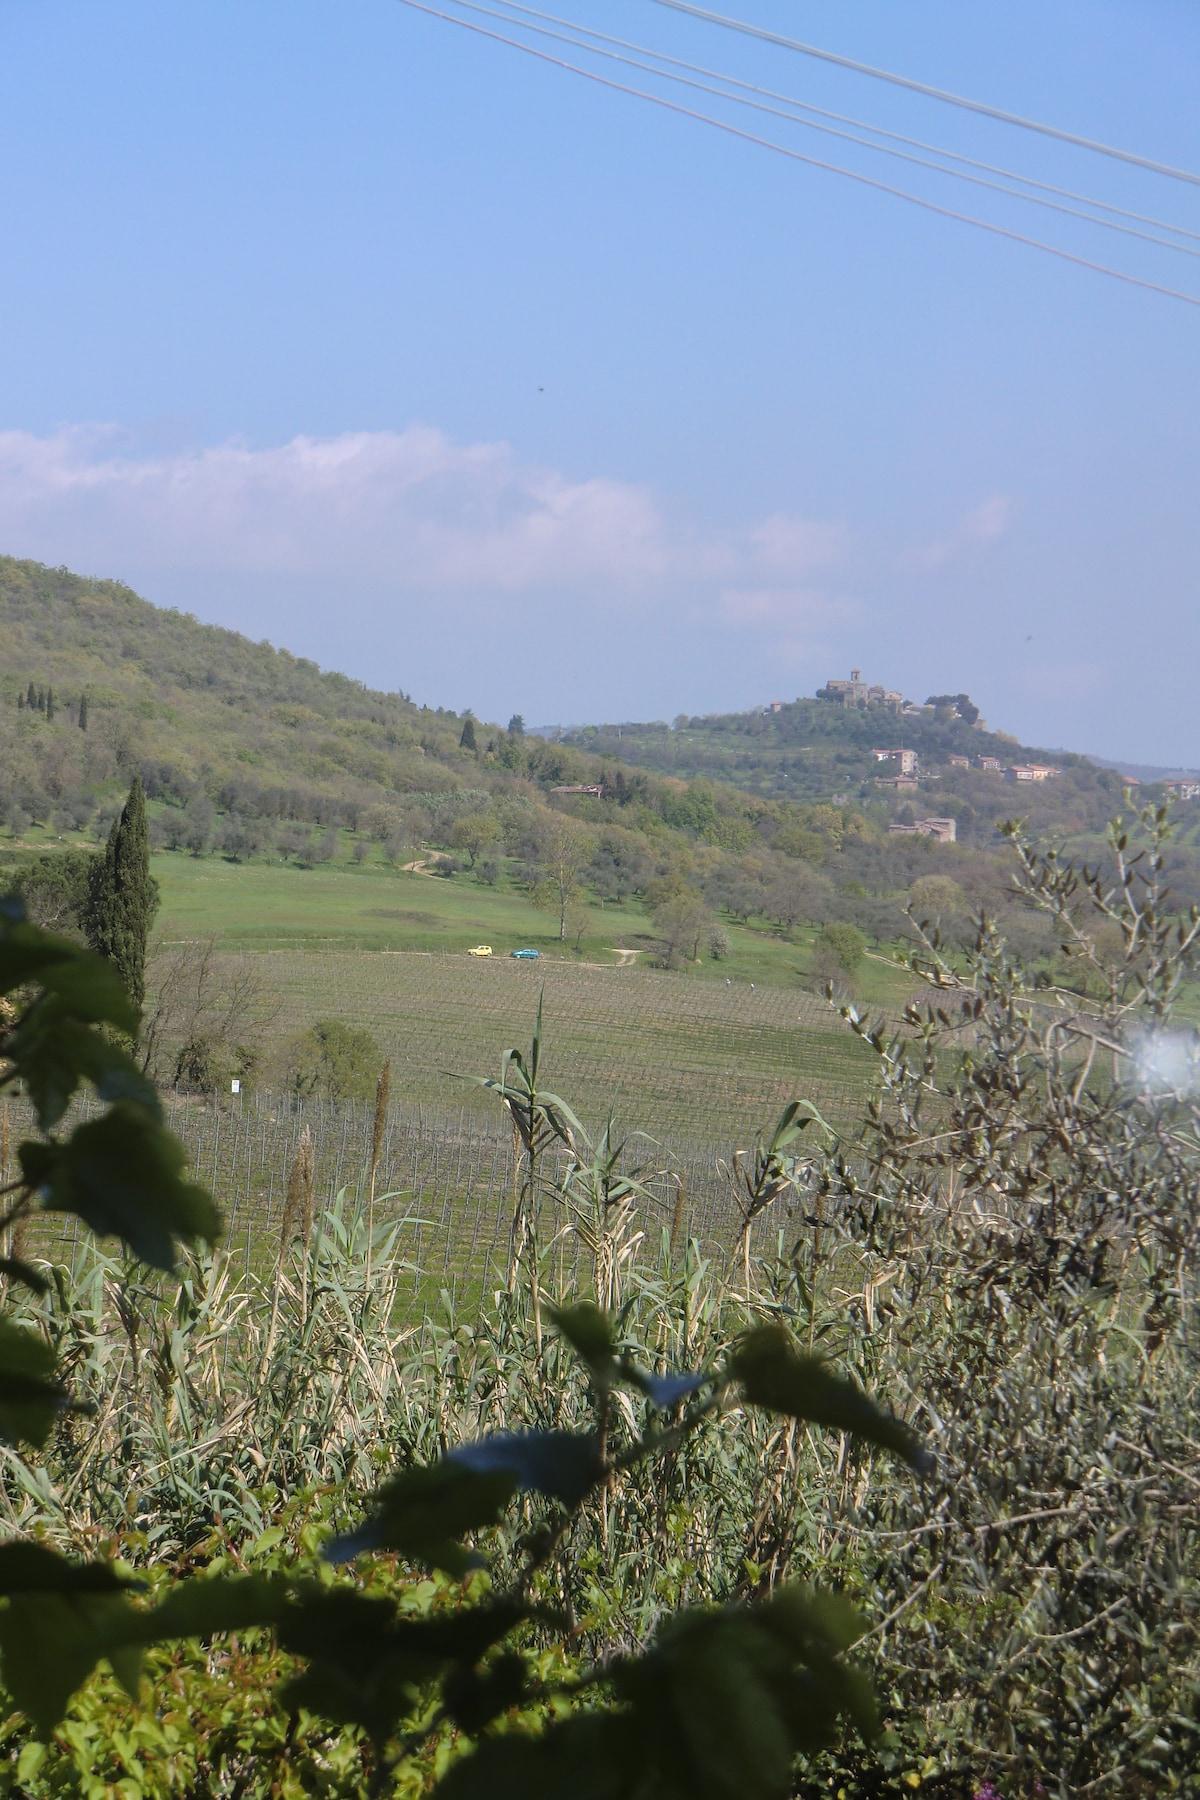 Casa/chalet in campagna